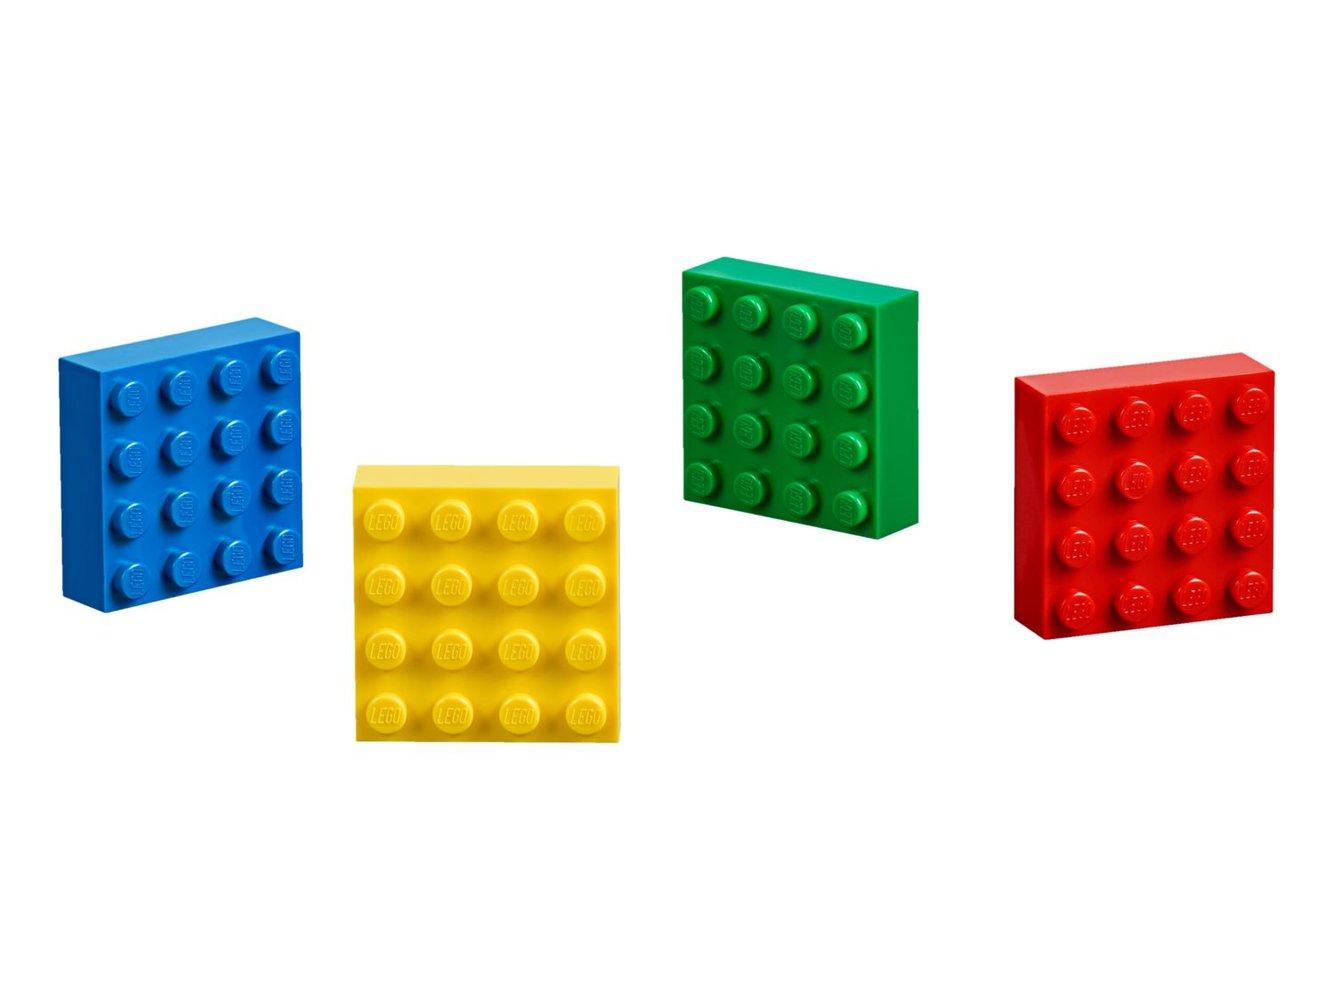 4x4 Brick Magnets Classic